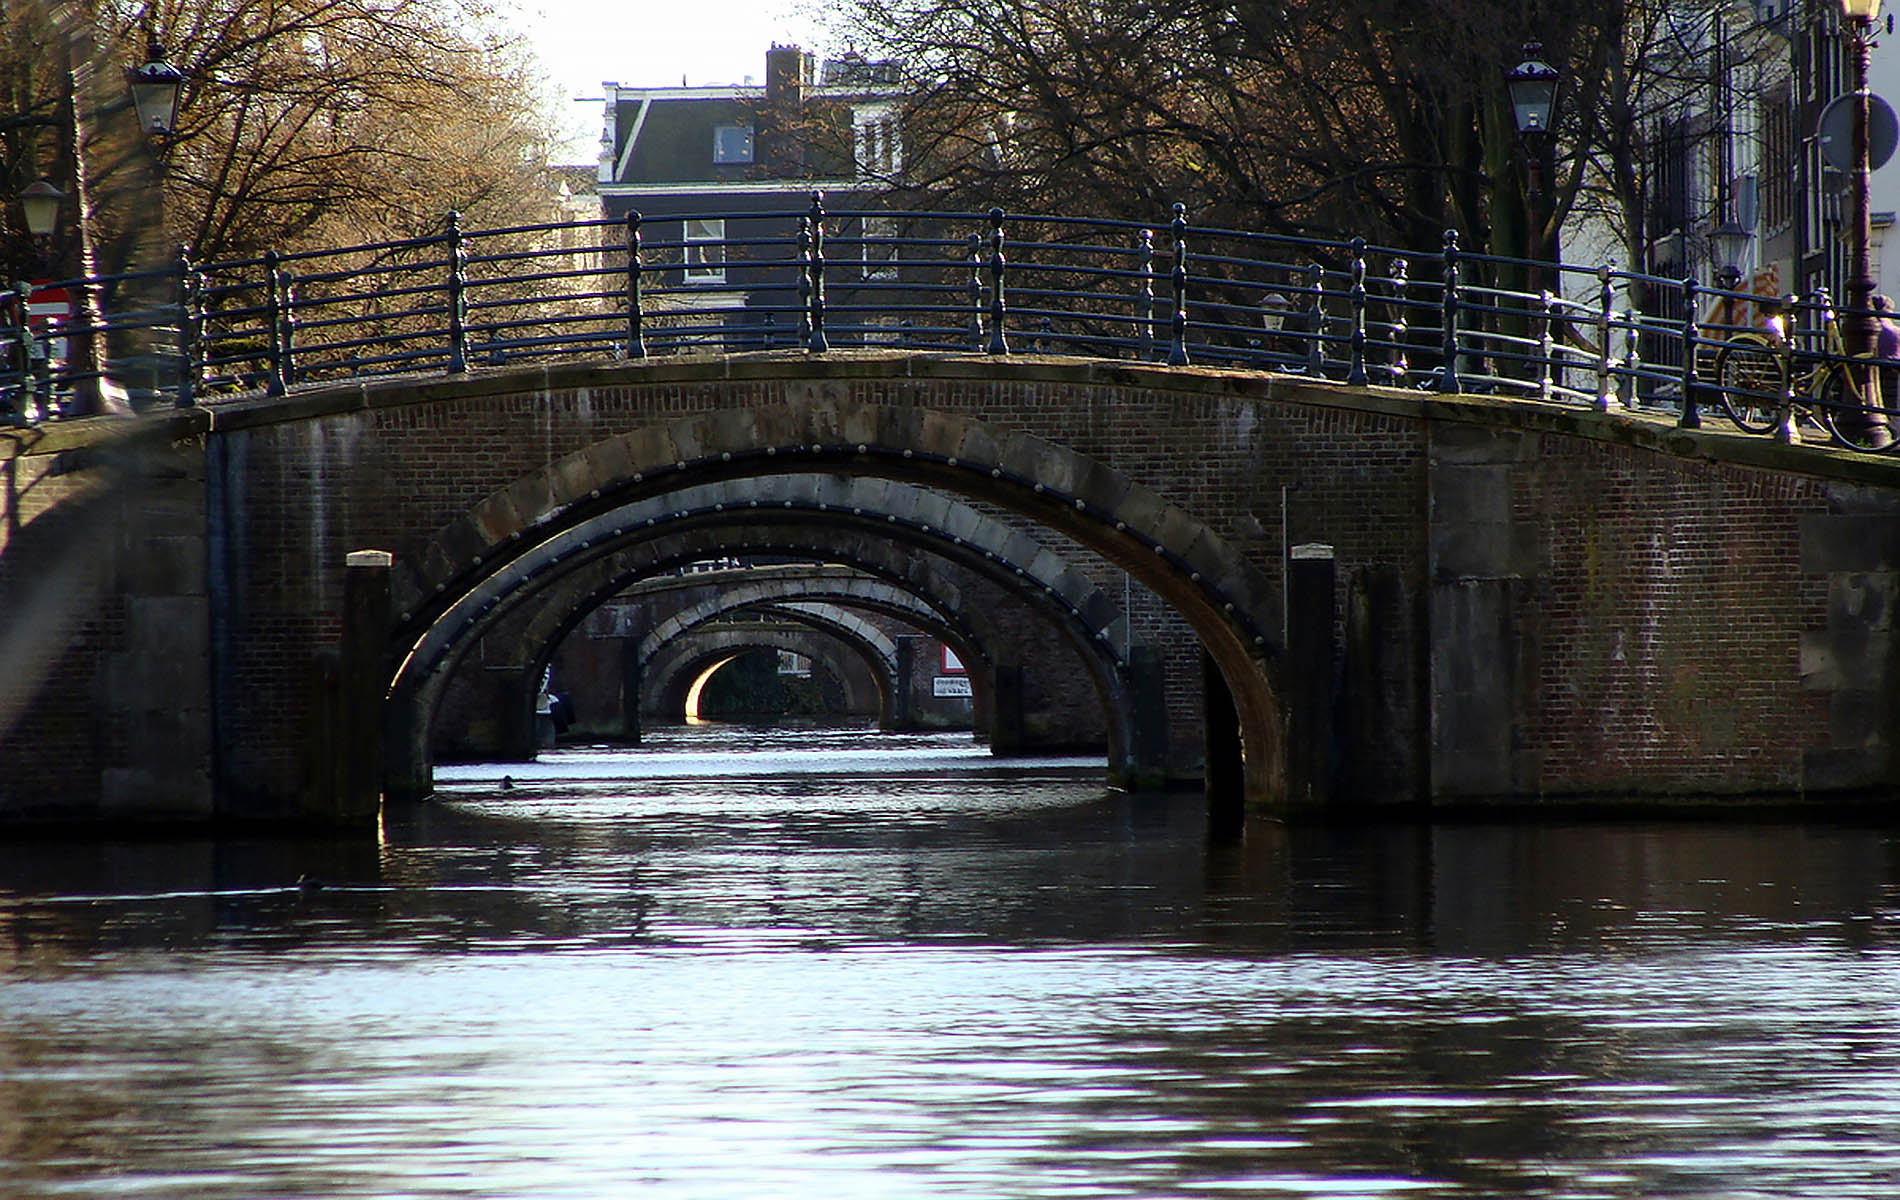 Dinner cruise Amsterdam zeven-bruggen-amsterdam